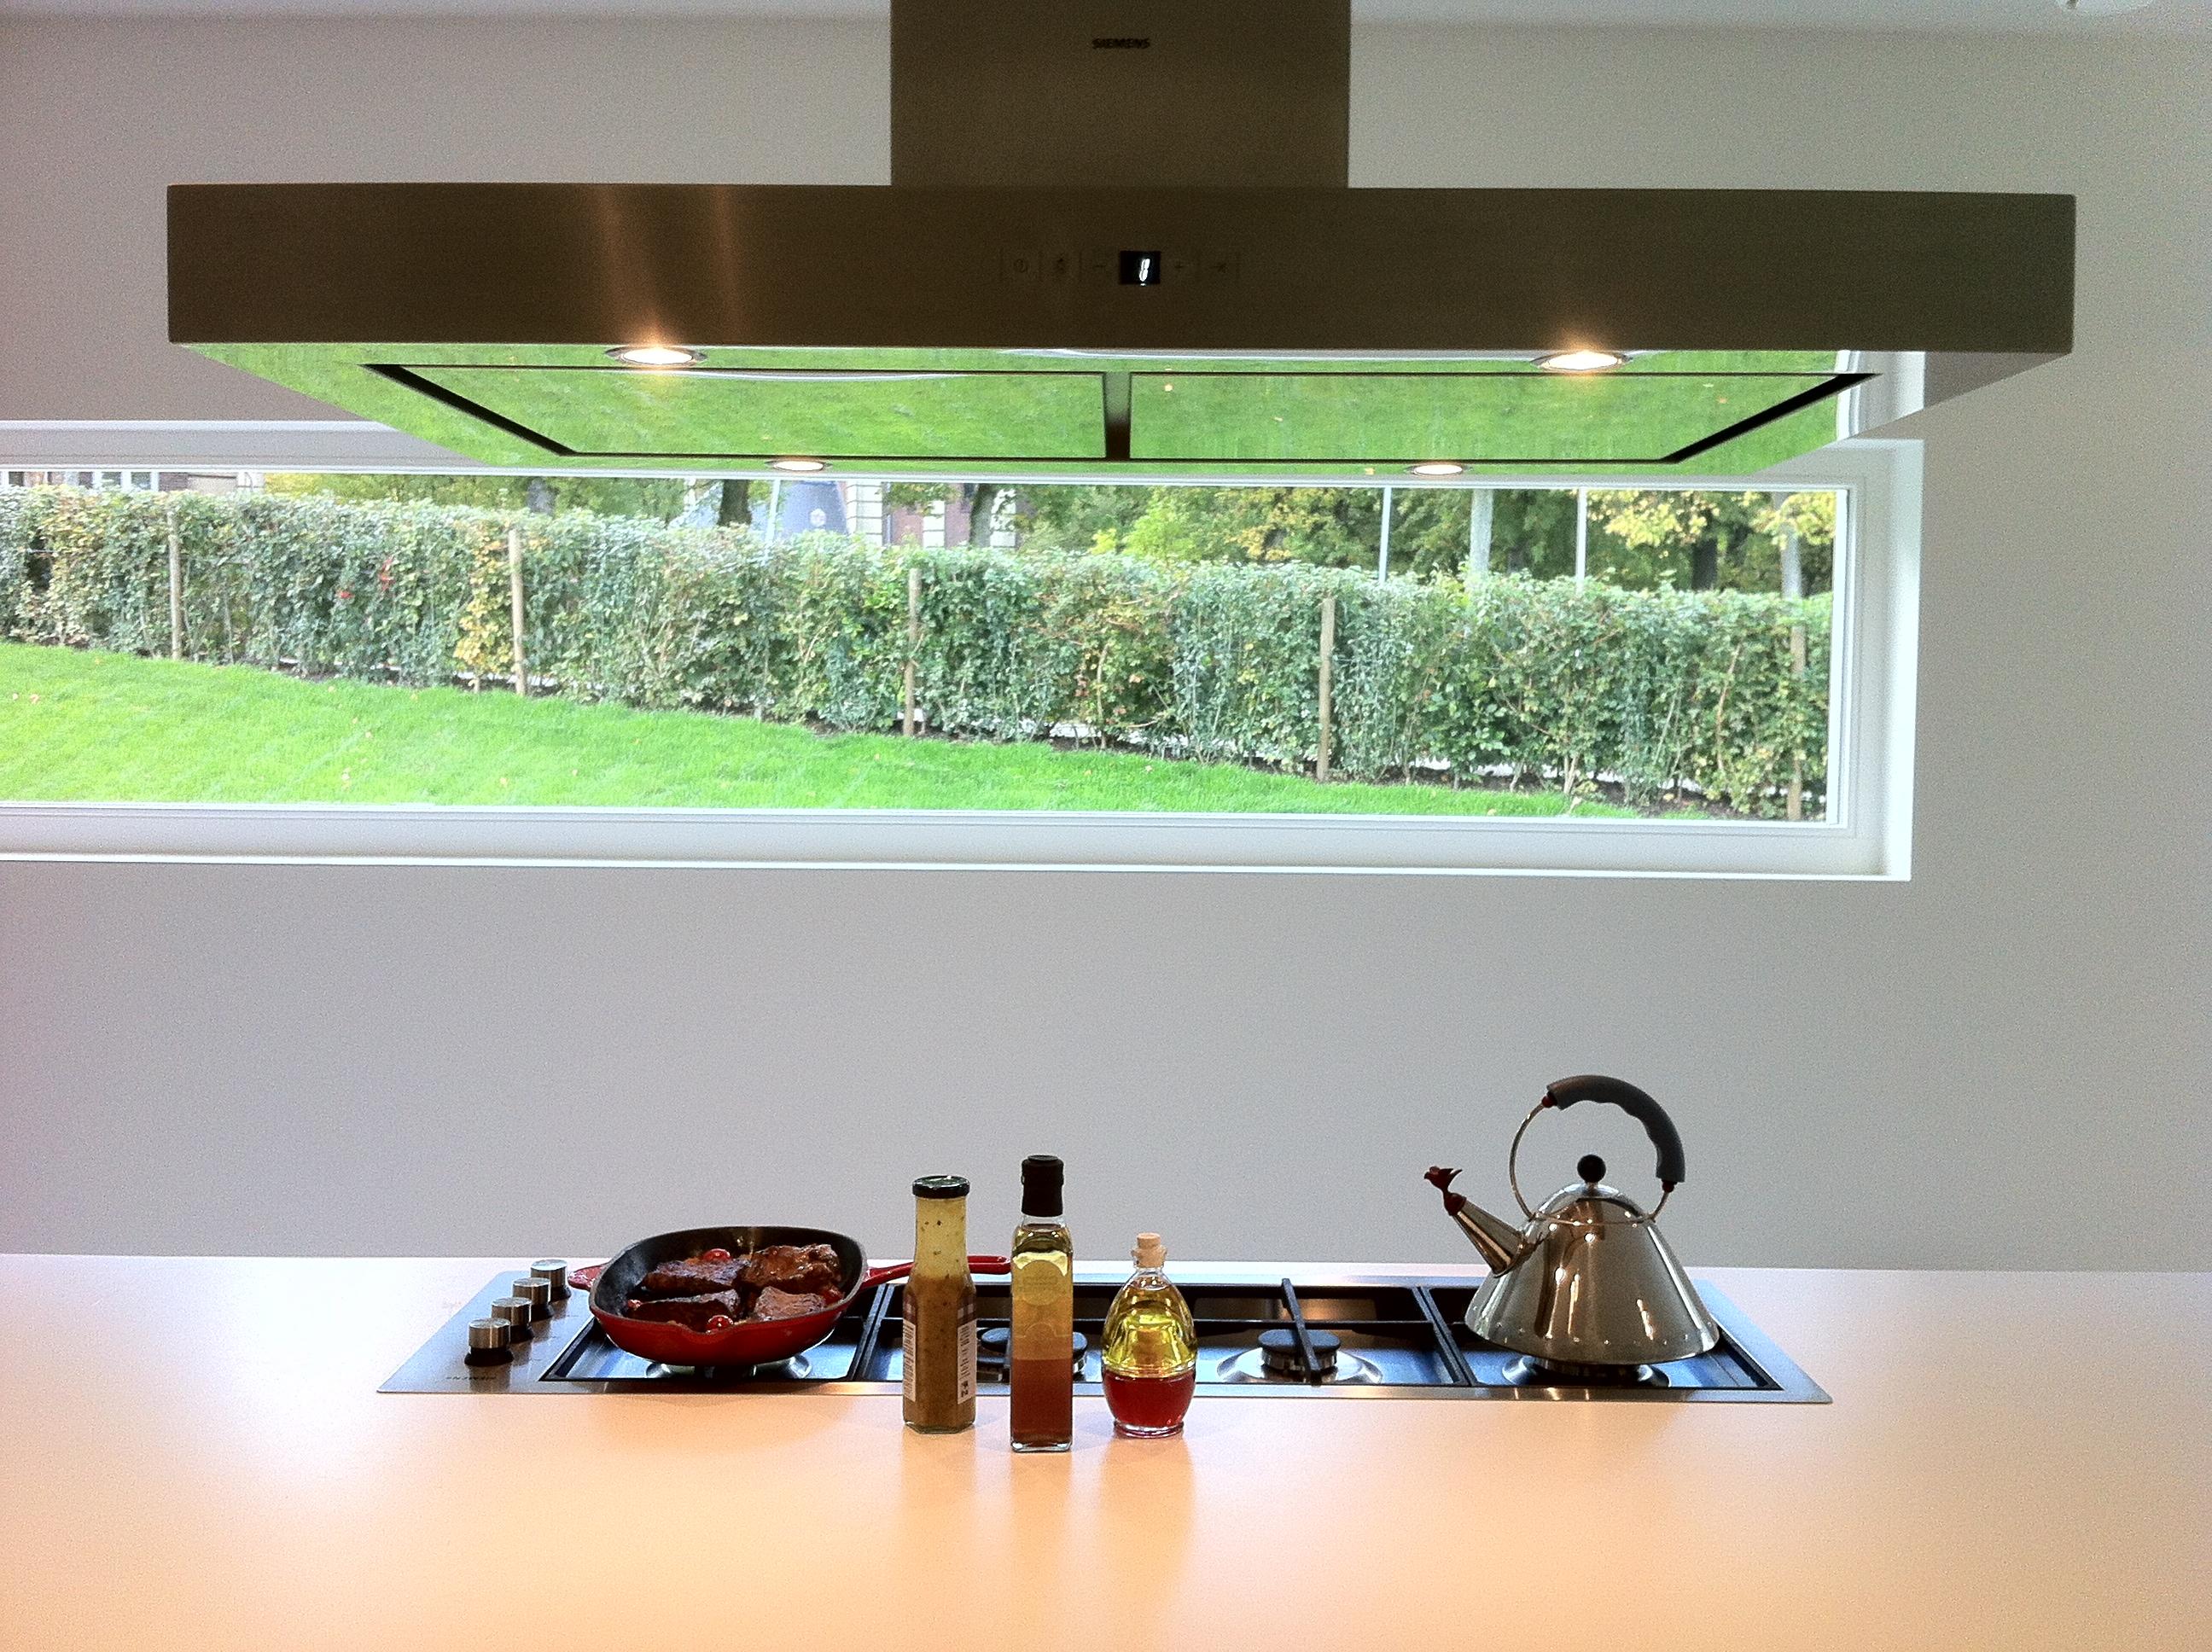 Wallpaper Men White Food Window Architecture E Minimalism Futuristic Table House Gl Office Simple Kitchen Luxury Panorama